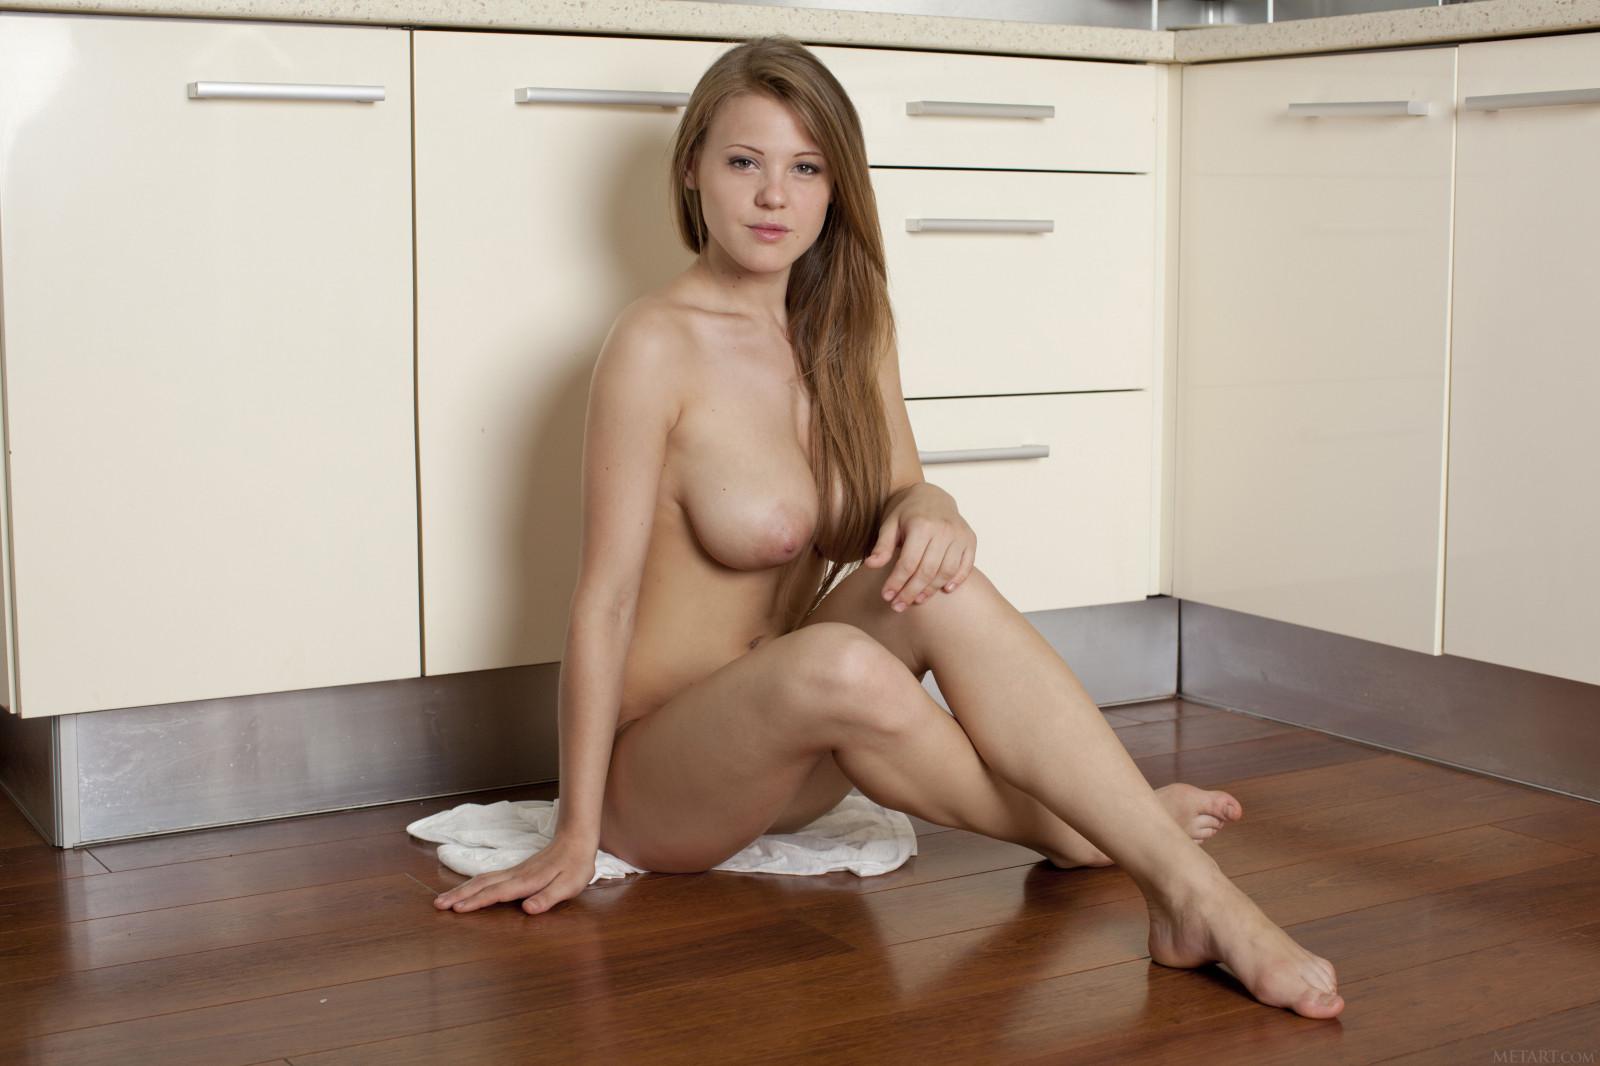 daisy marie porno filmy